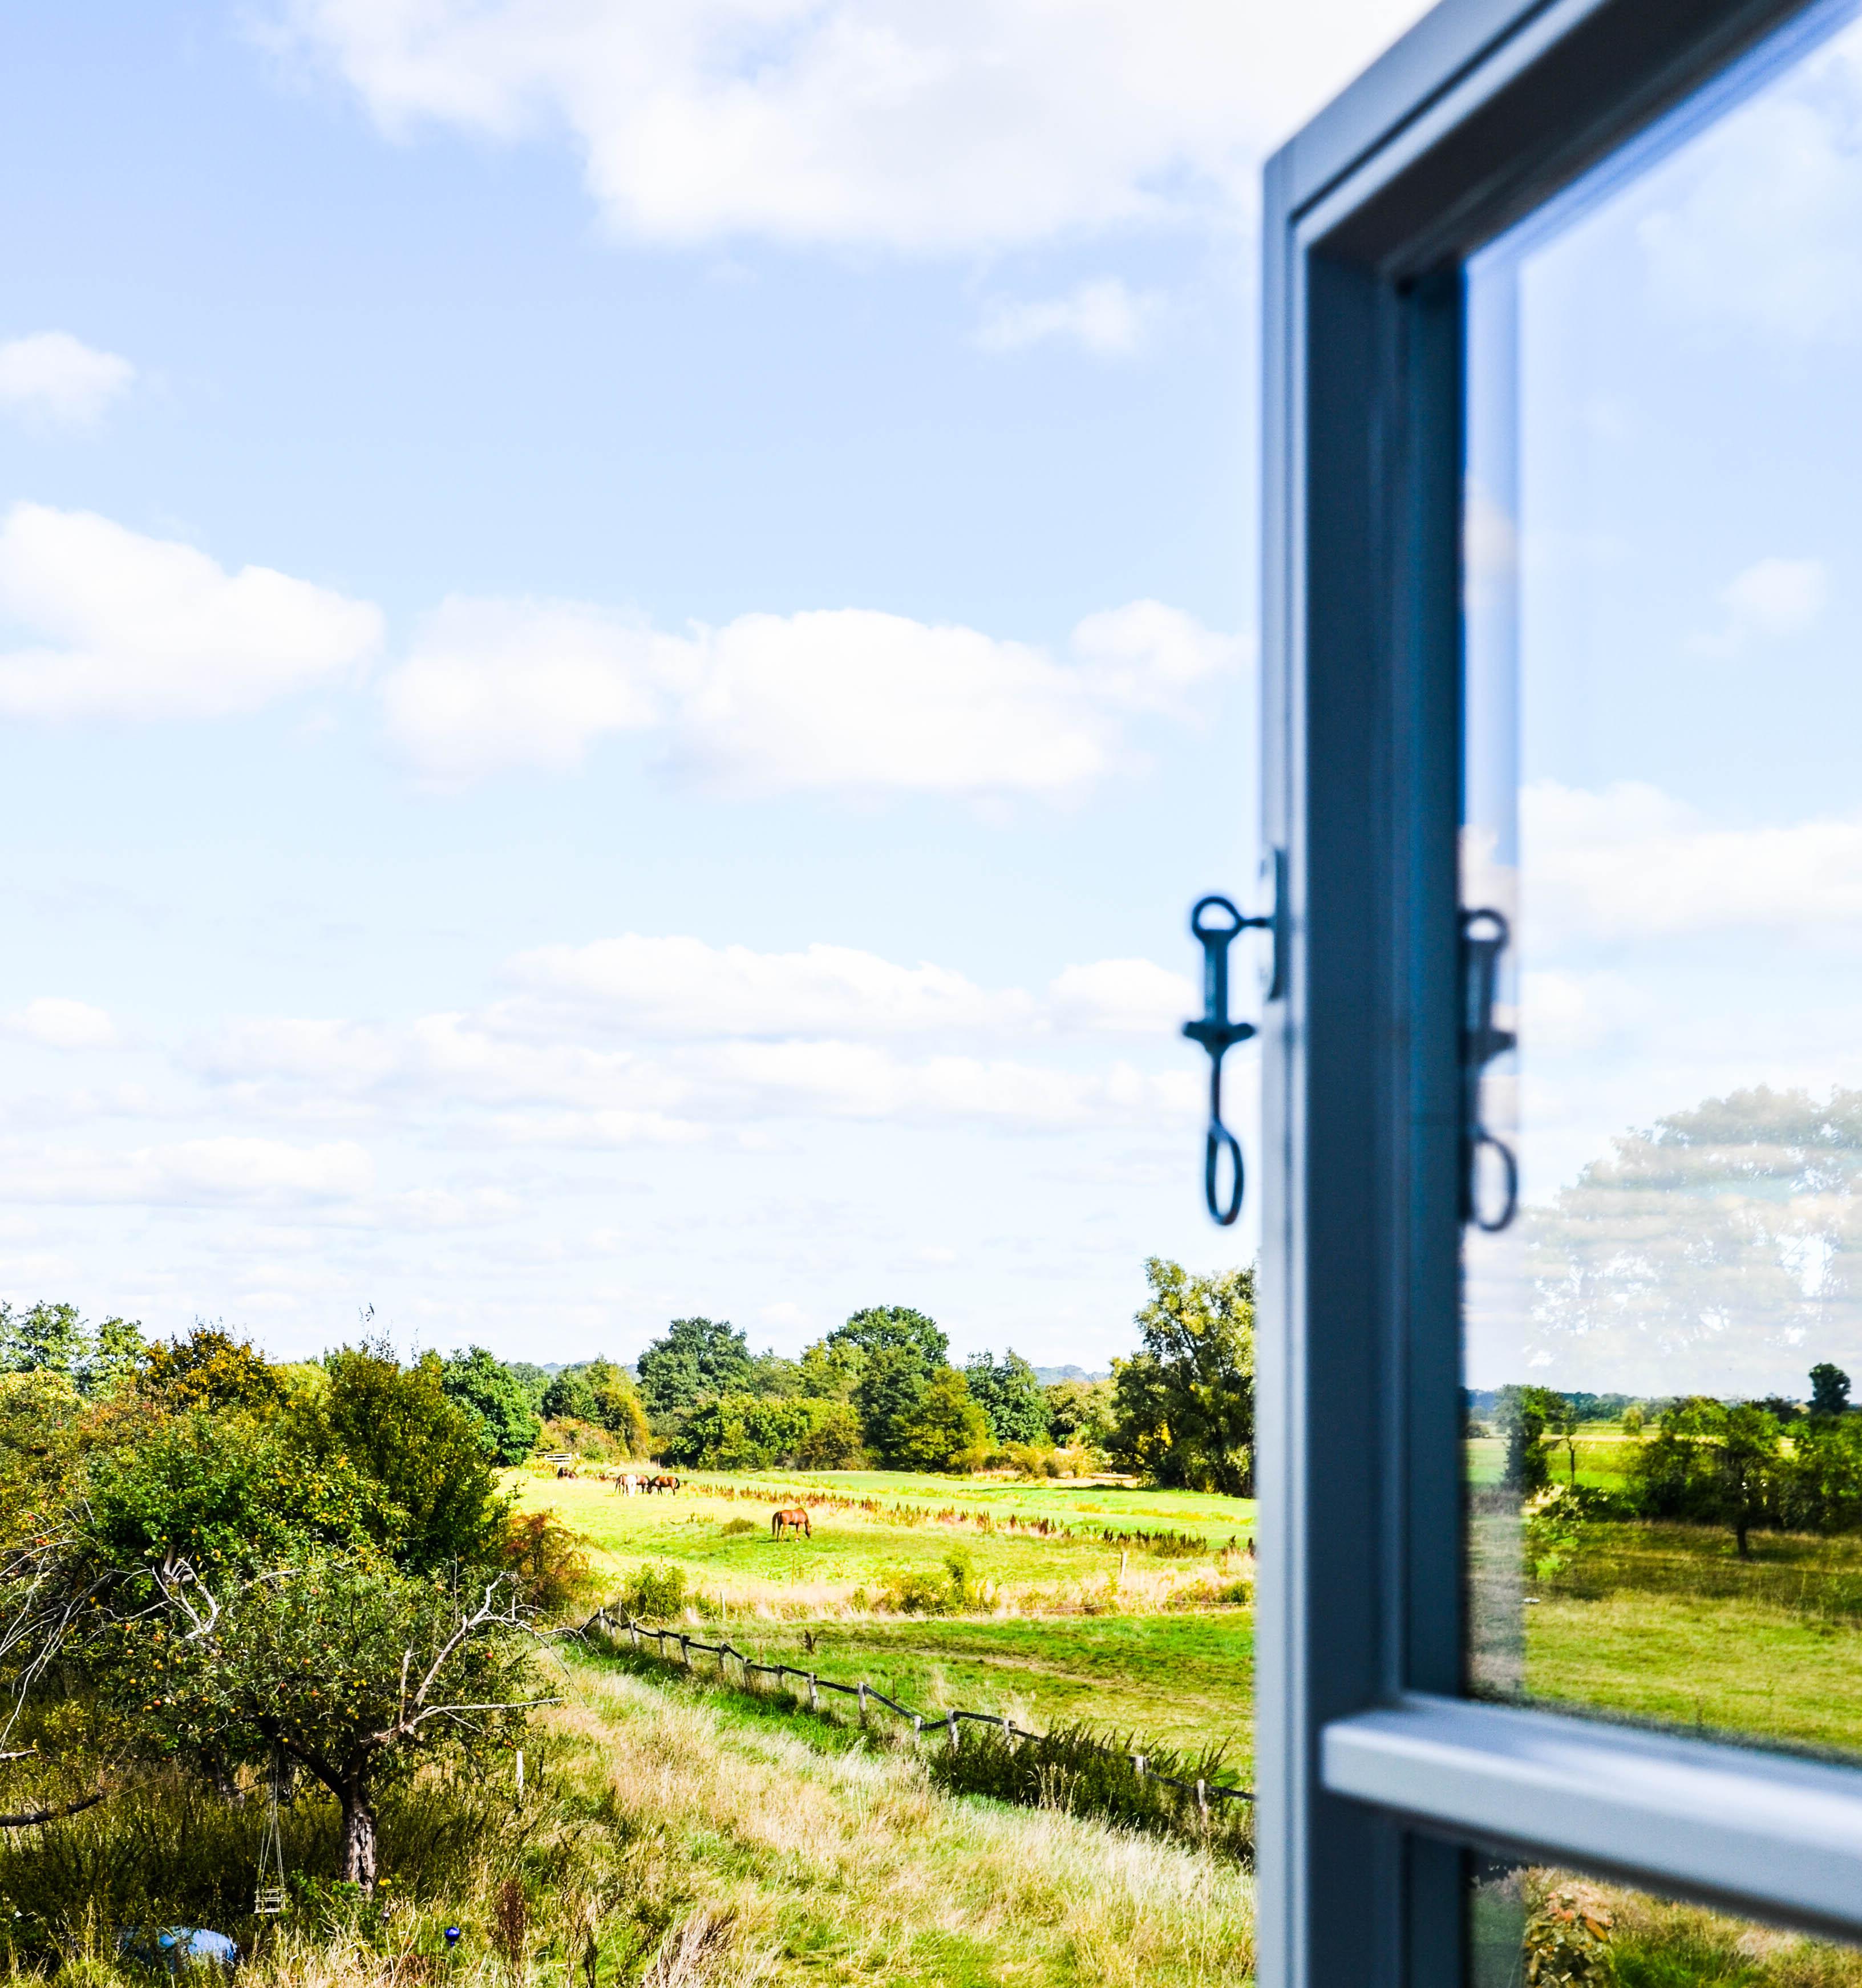 Natur, Blick aus dem Fenster,